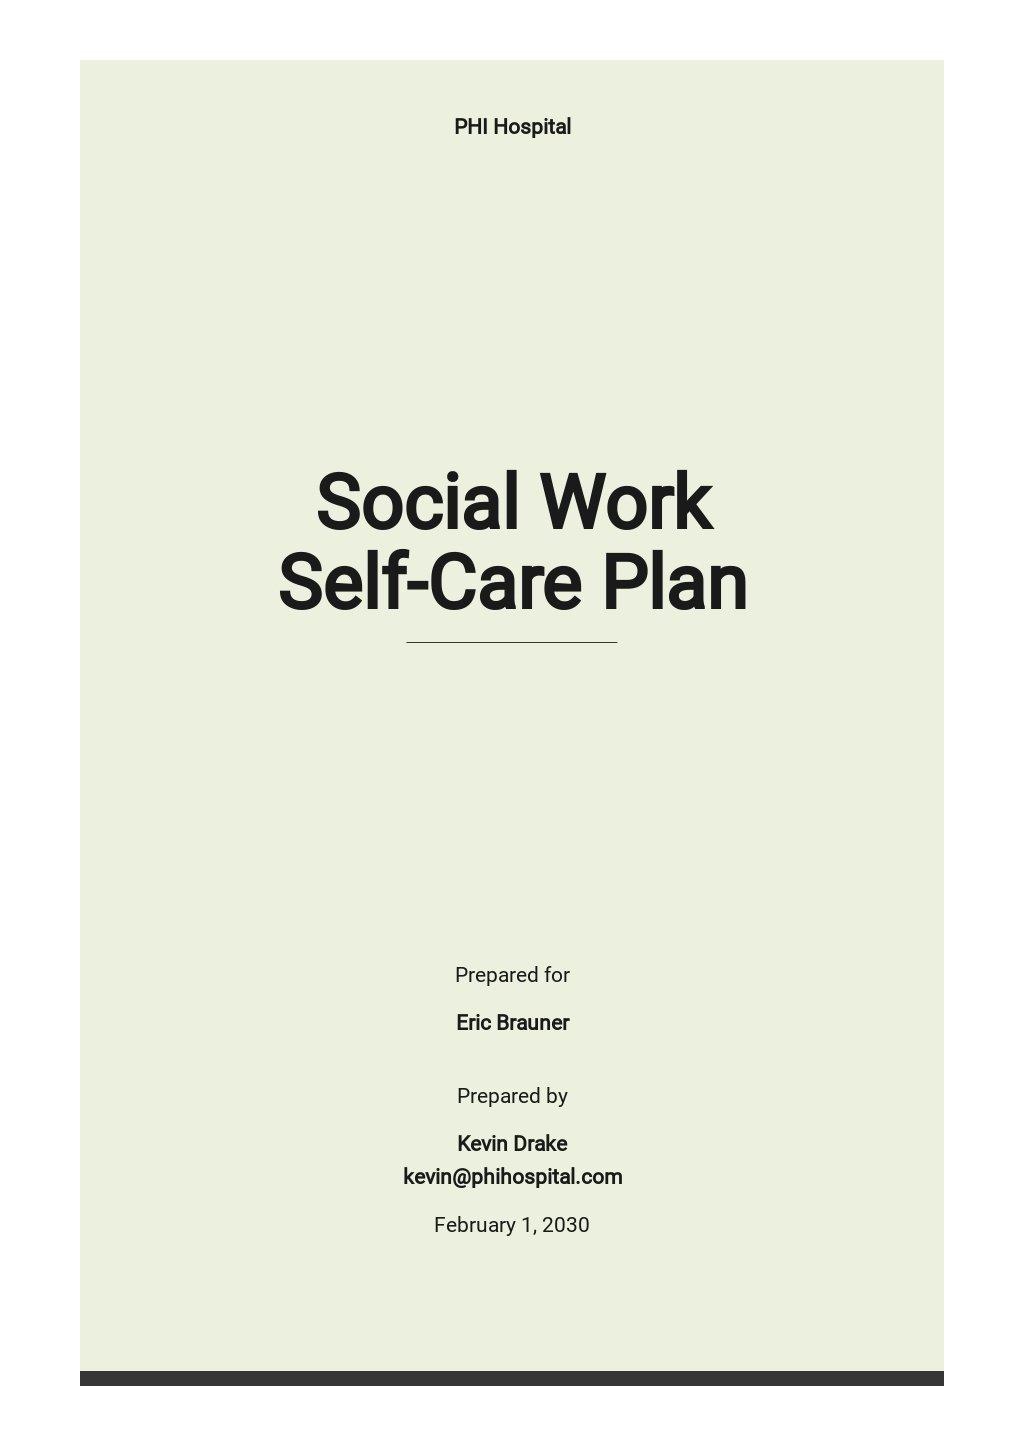 Social Work Self Care Plan Template.jpe